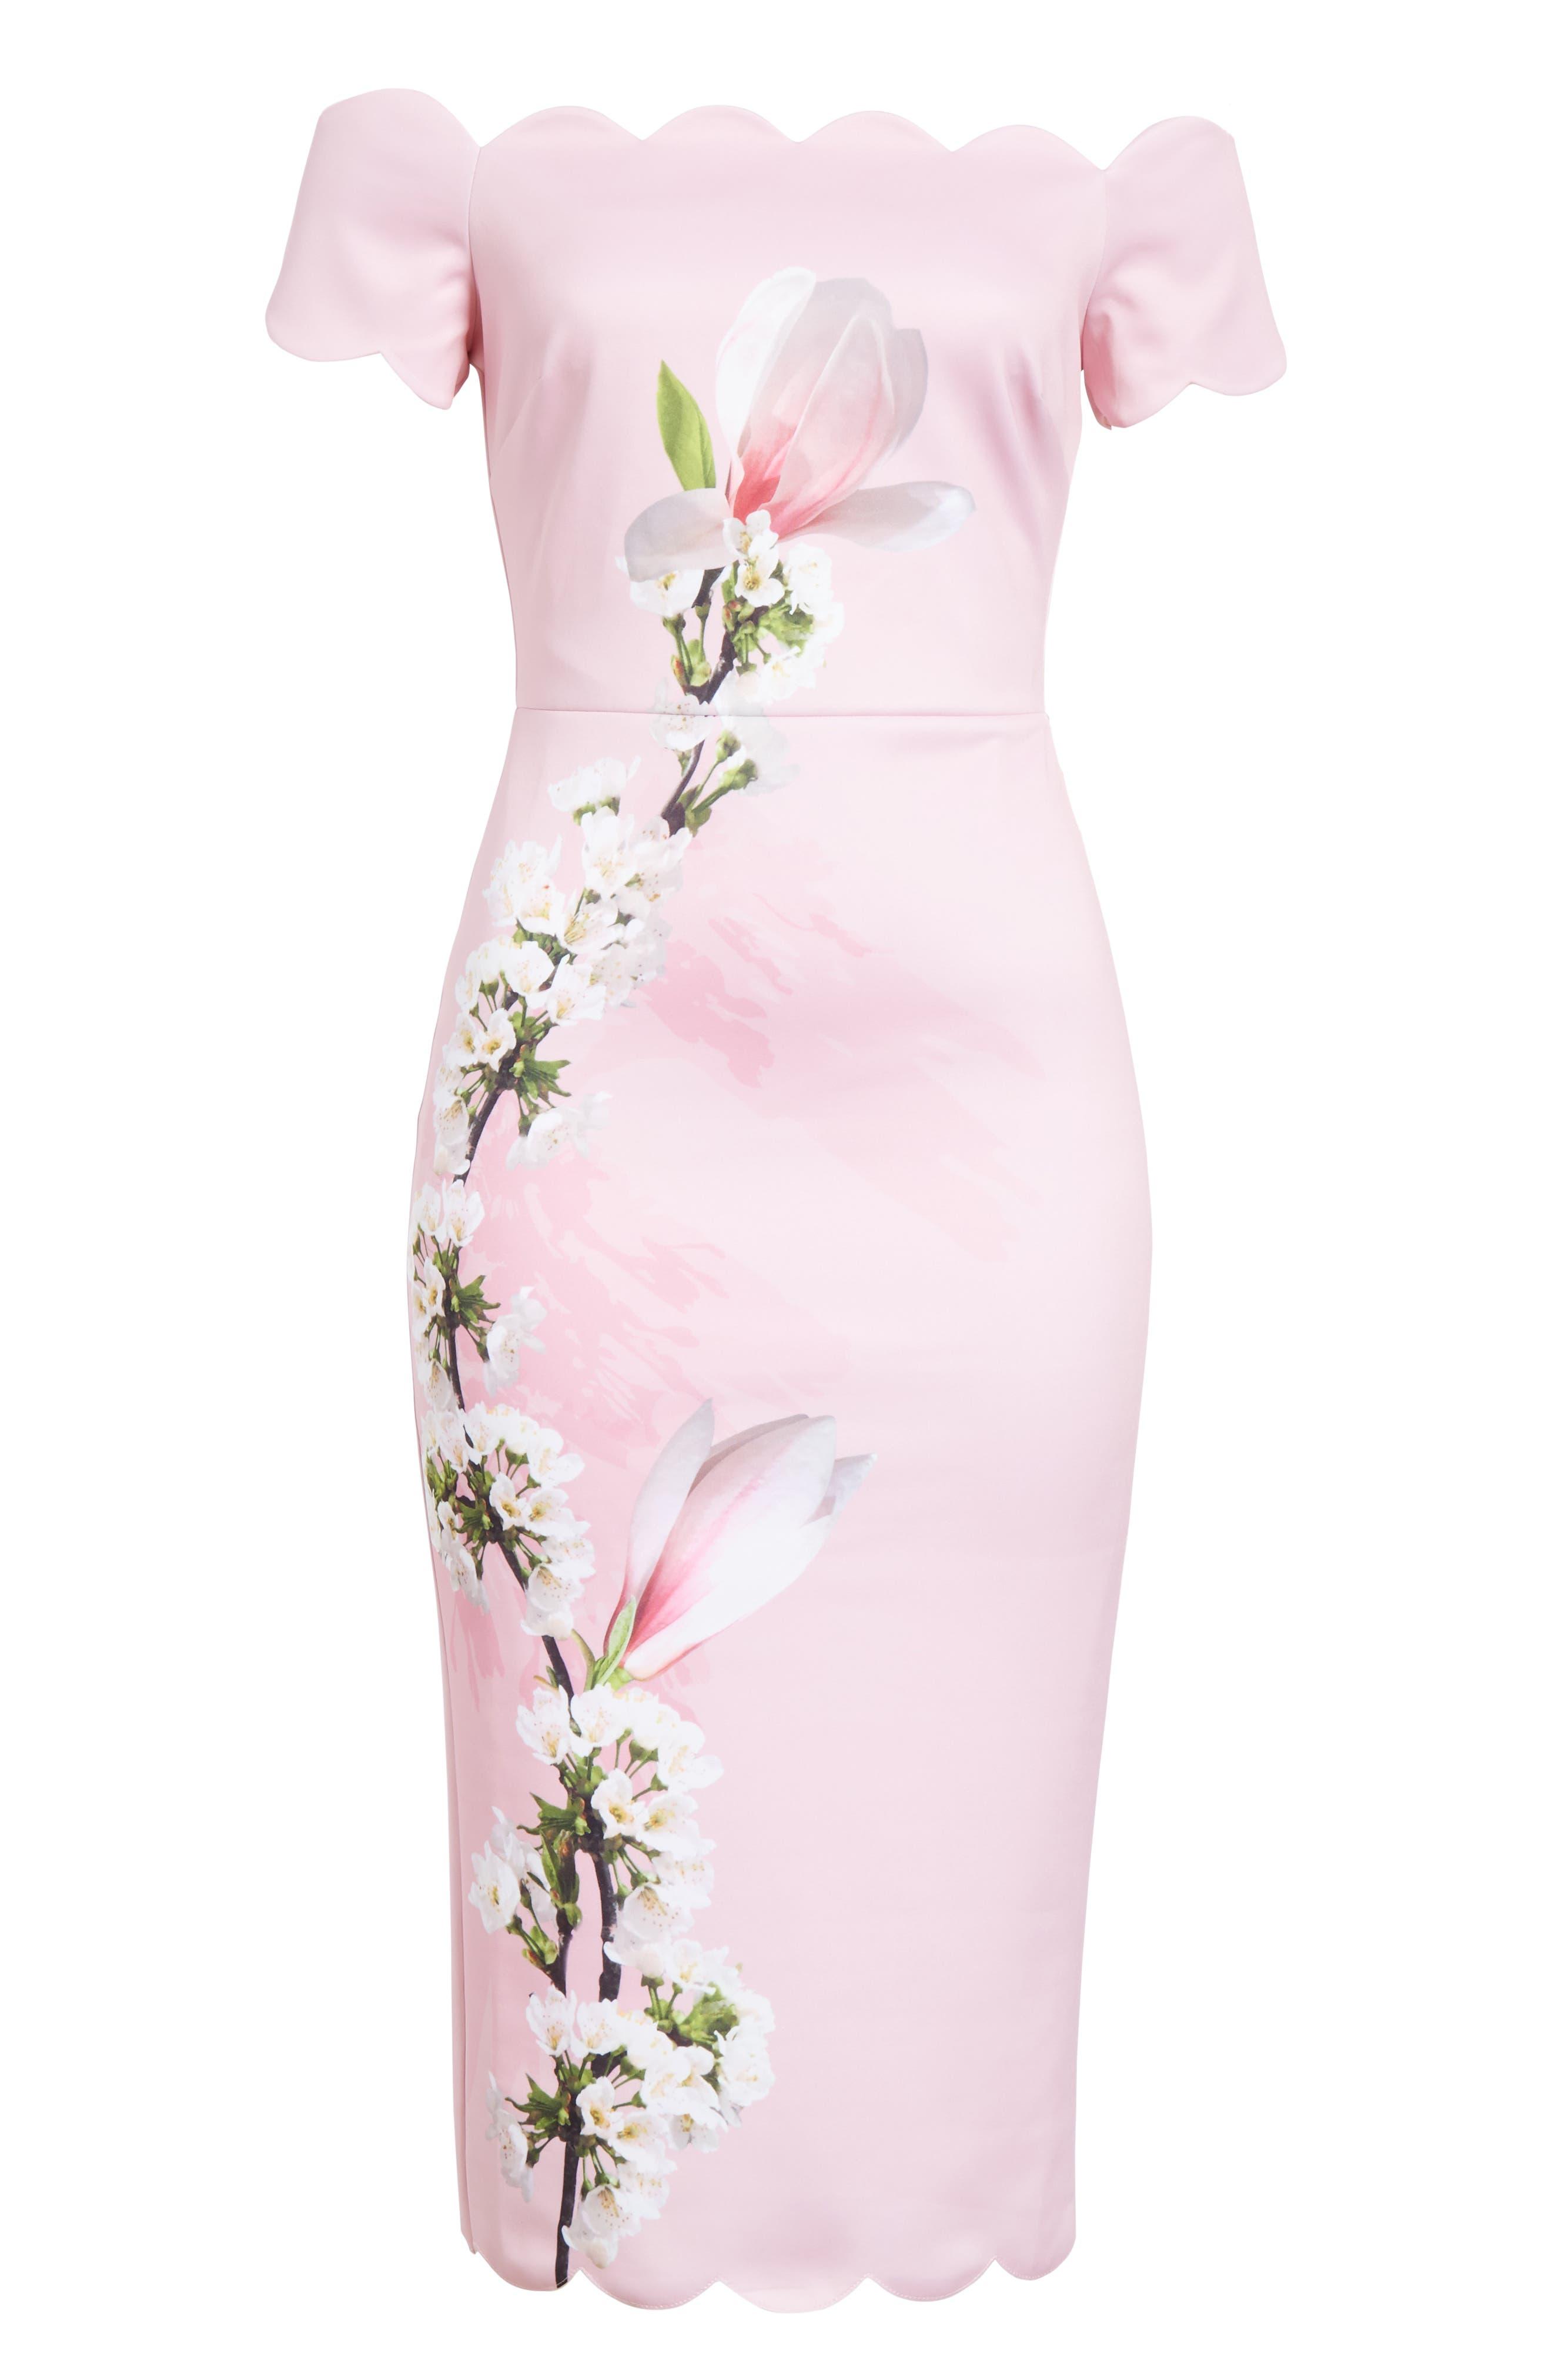 Olyva Harmony Body-Con Dress,                             Alternate thumbnail 6, color,                             PALE PINK